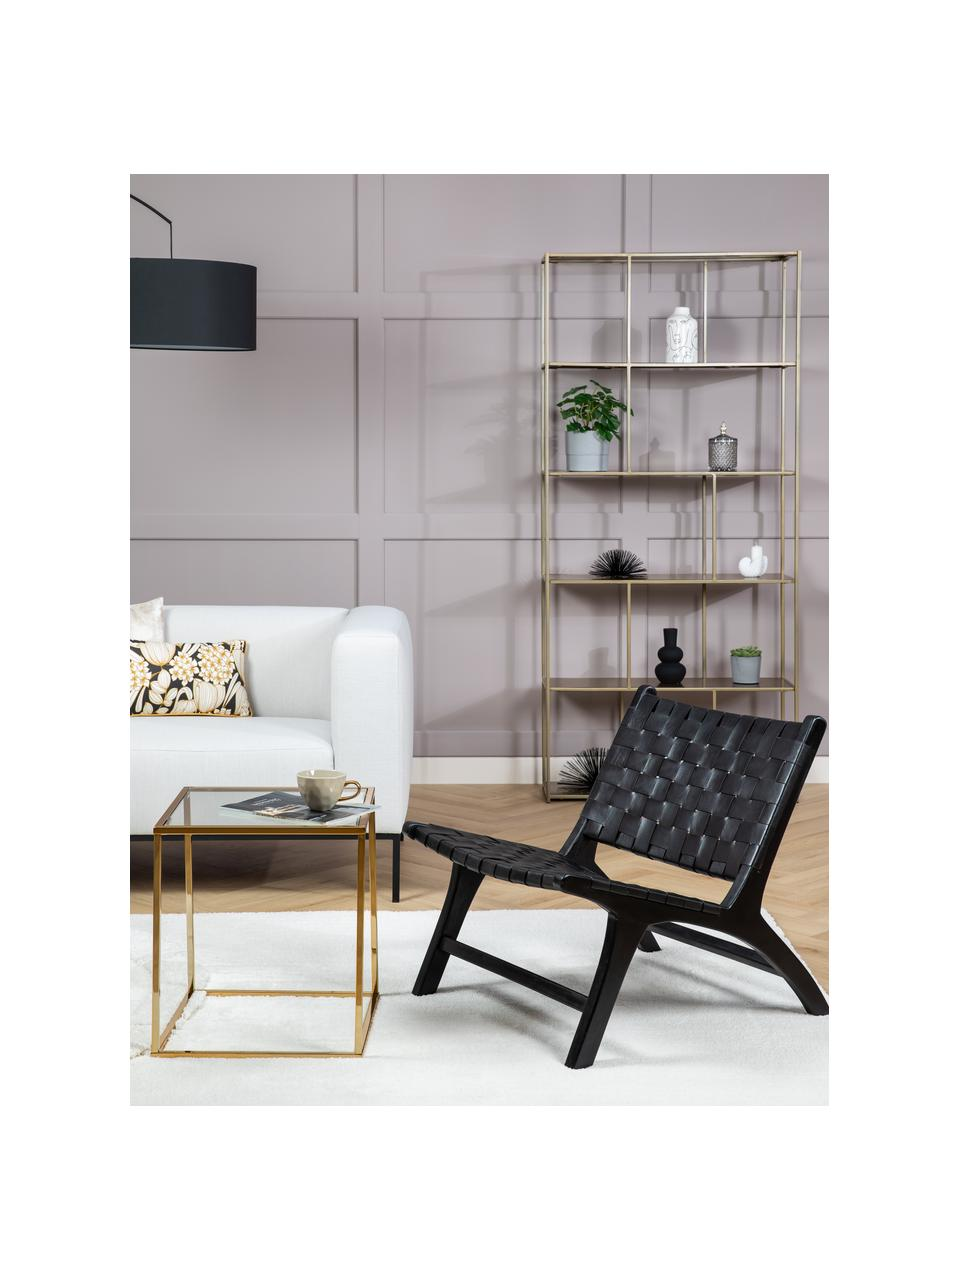 Sedia a poltrona in pelle Calixta, Struttura: legno di mogano, Seduta: pelle, Nero, Larg. 65 x Prof. 76 cm